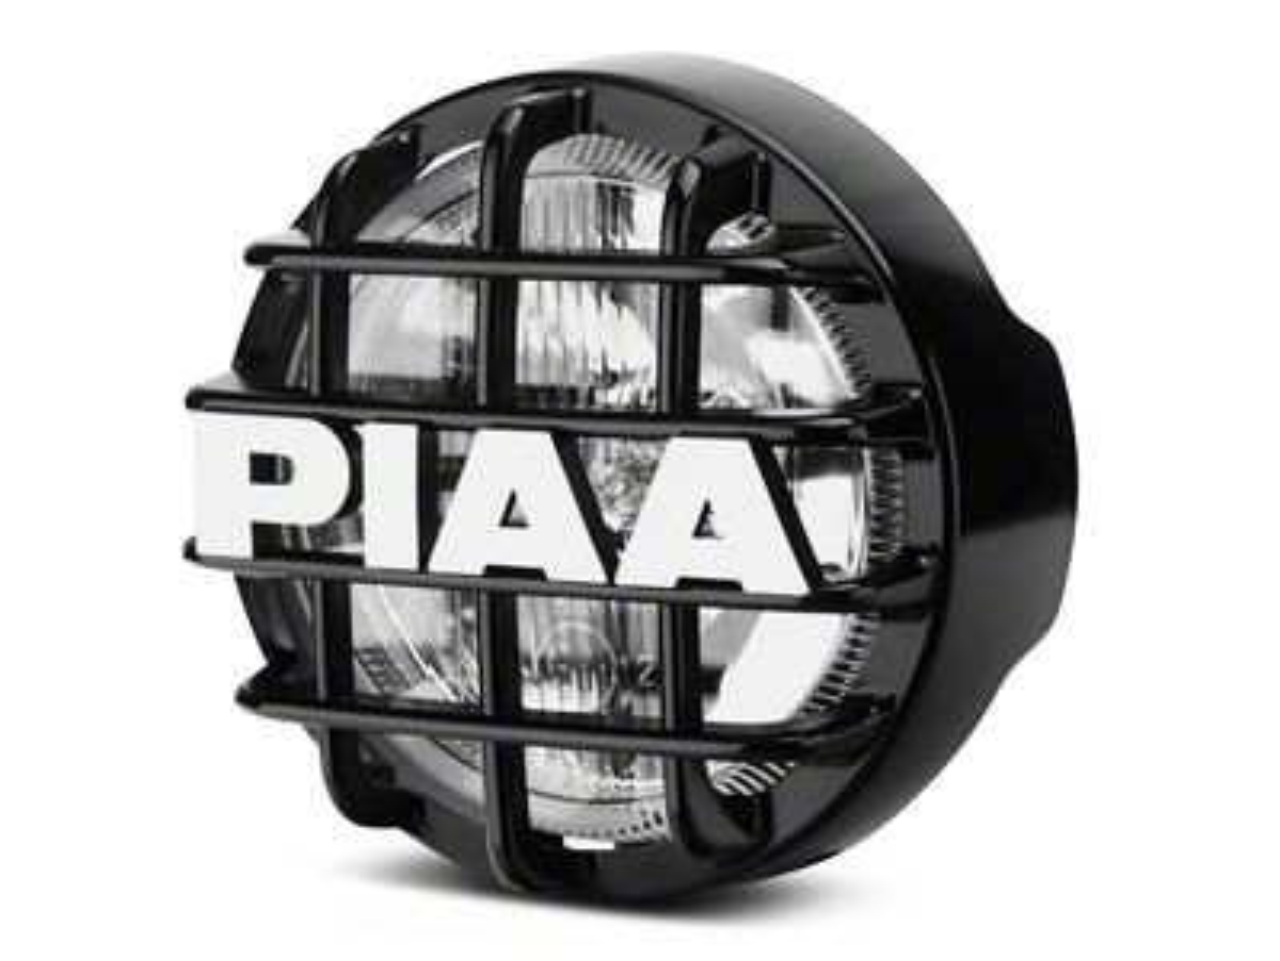 PIAA 510 Series 4 in. Round ATP Halogen Light (87-18 Jeep Wrangler YJ, TJ, JK & JL)